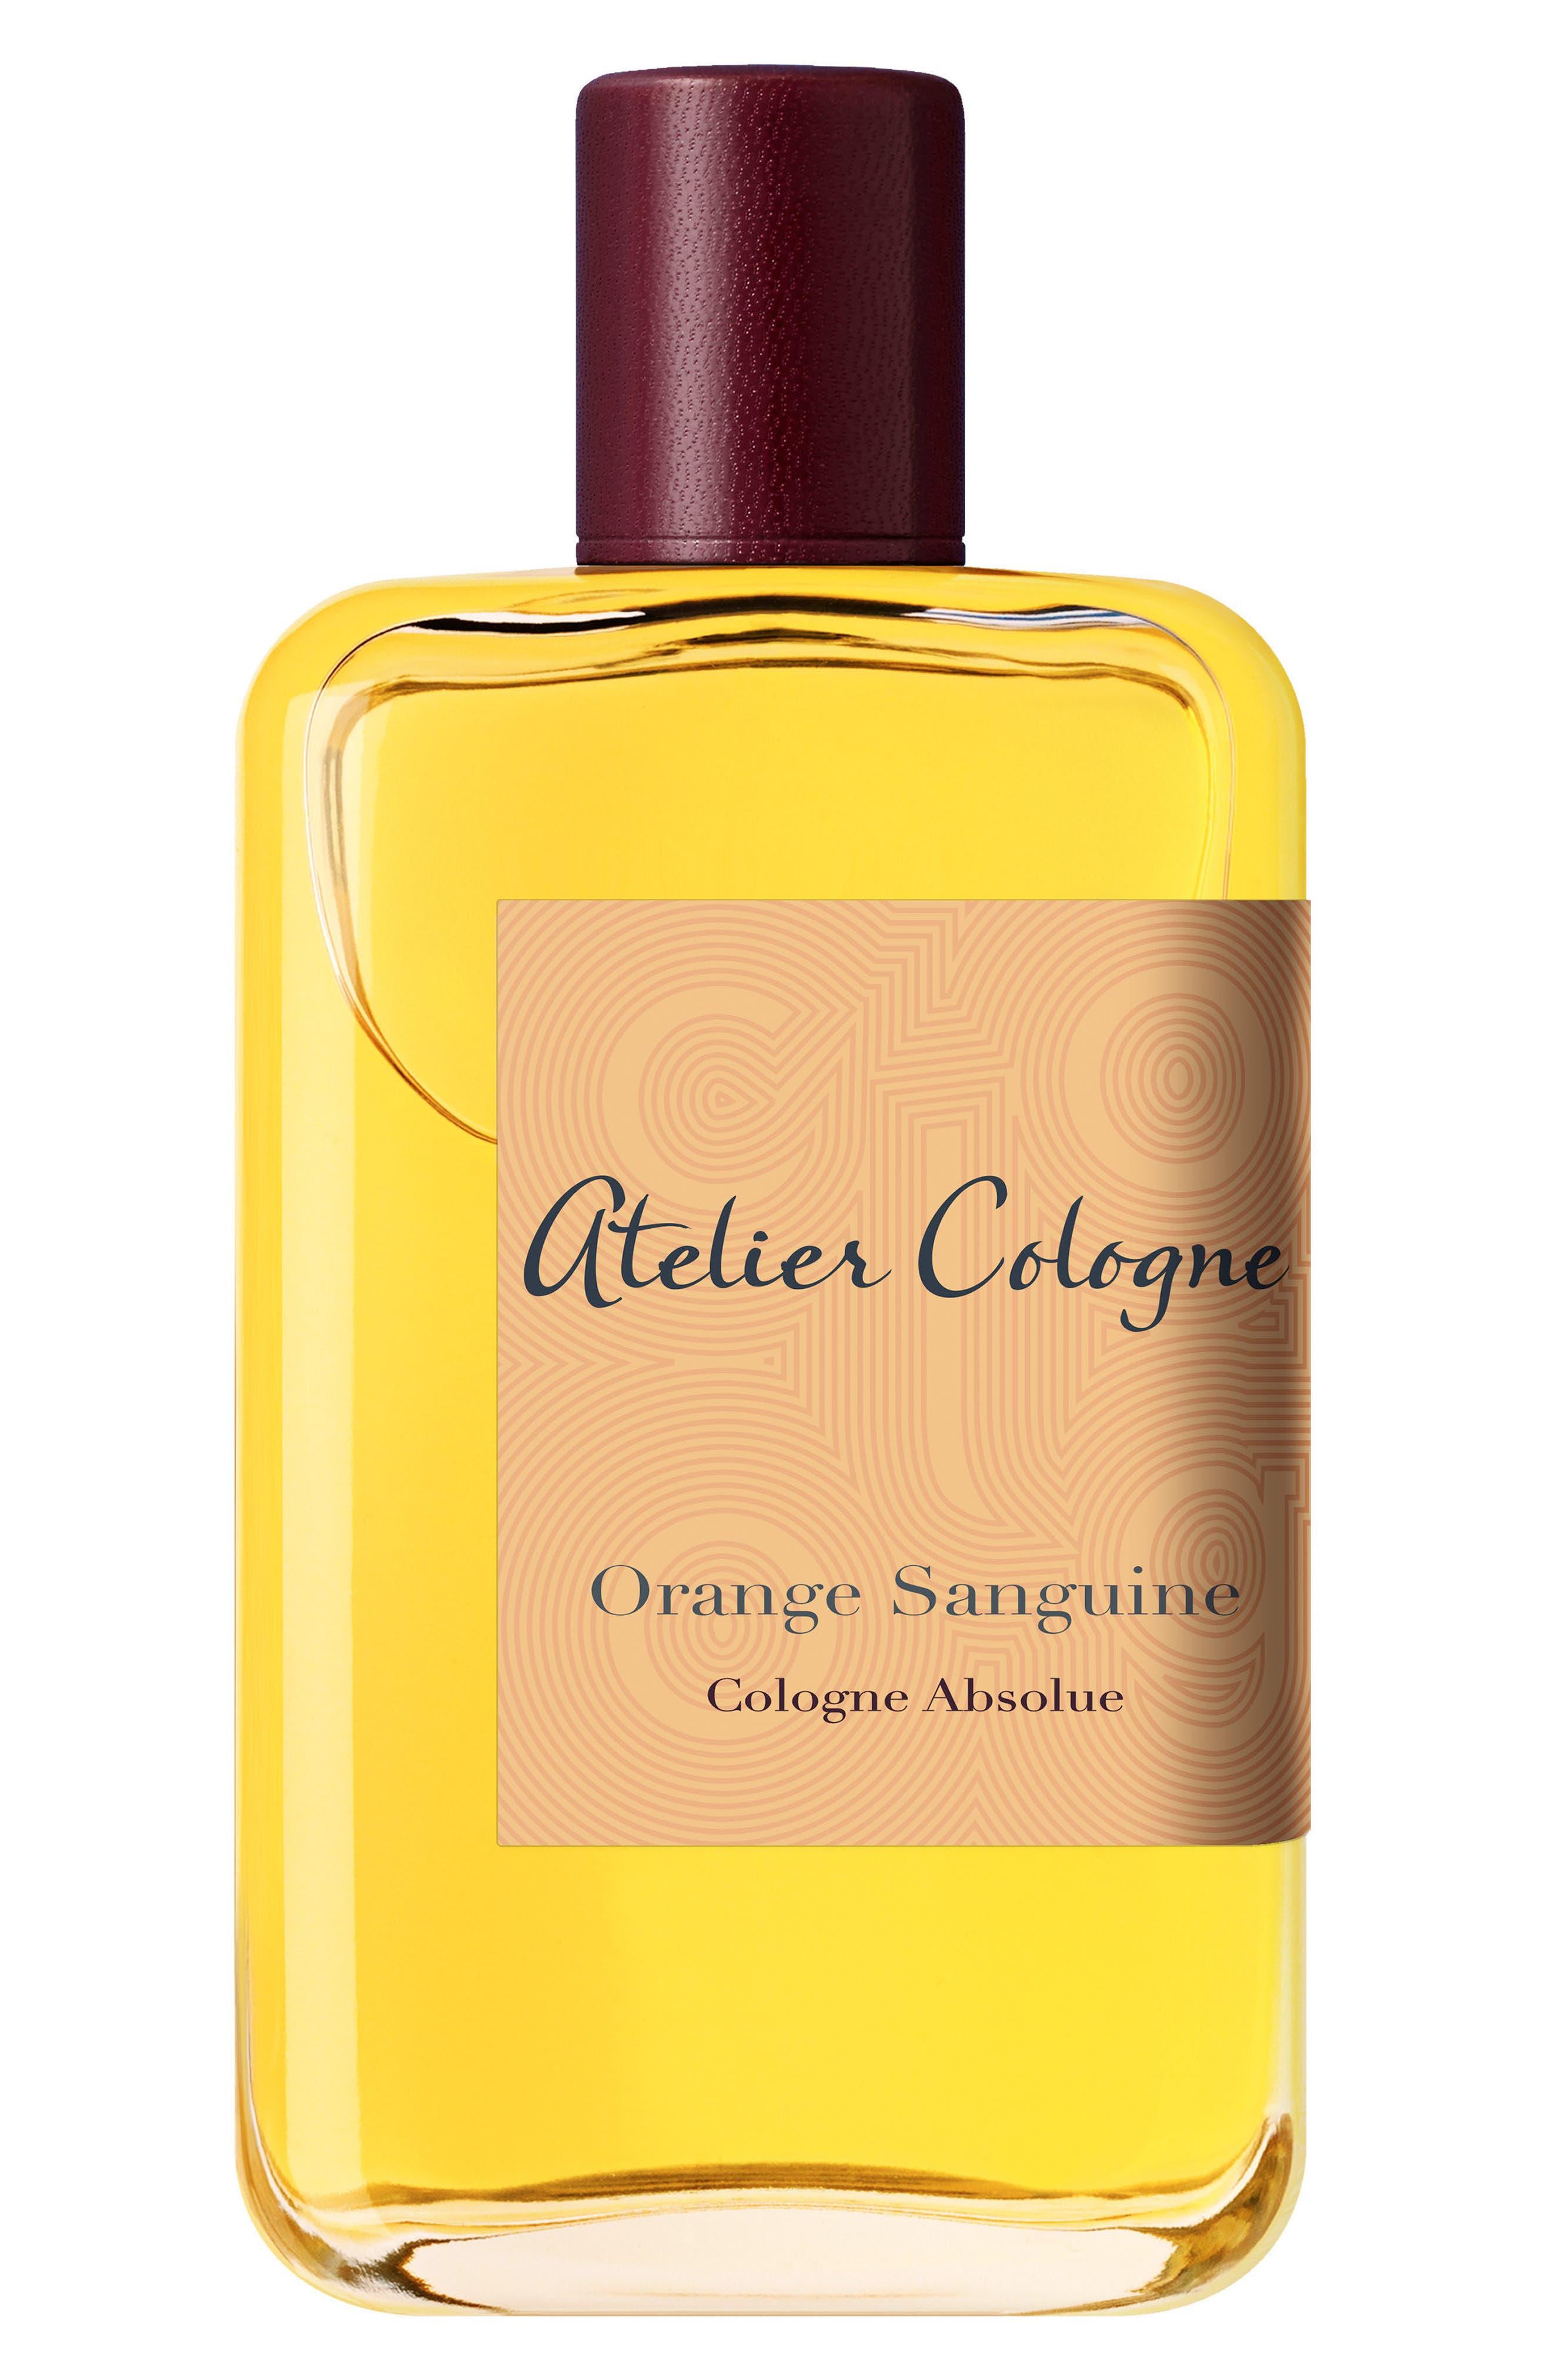 Orange Sanguine Cologne Absolue